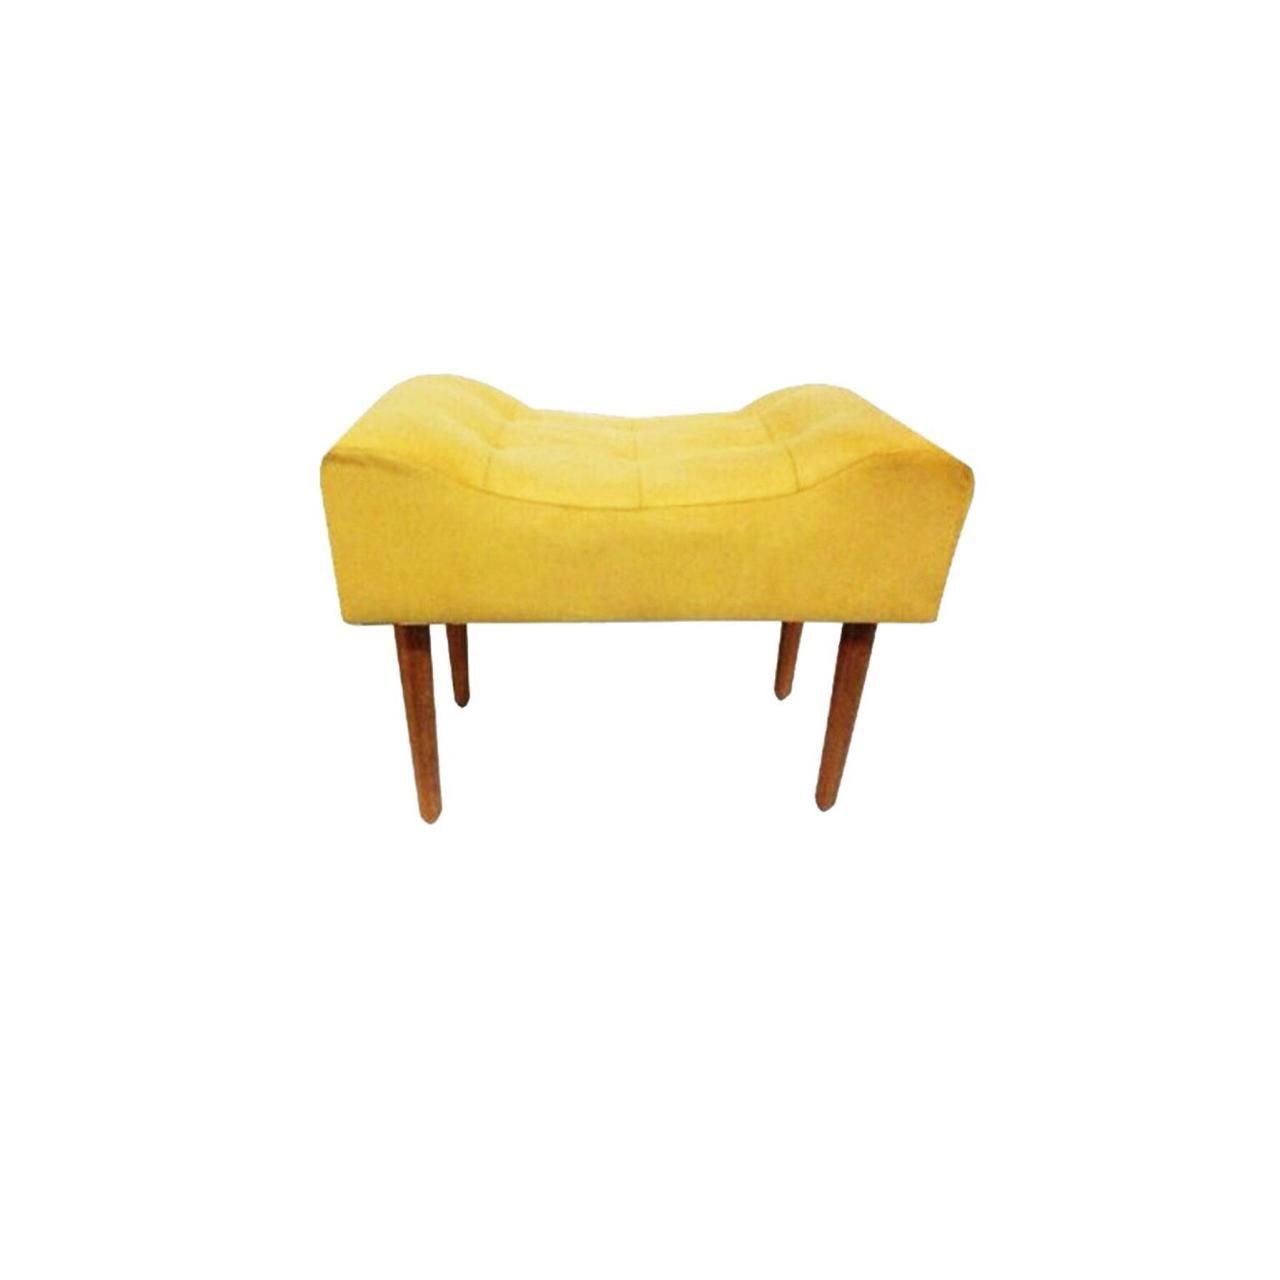 Kit Poltrona Decorativa Nina com rodapé e Puff retangular Amarelo